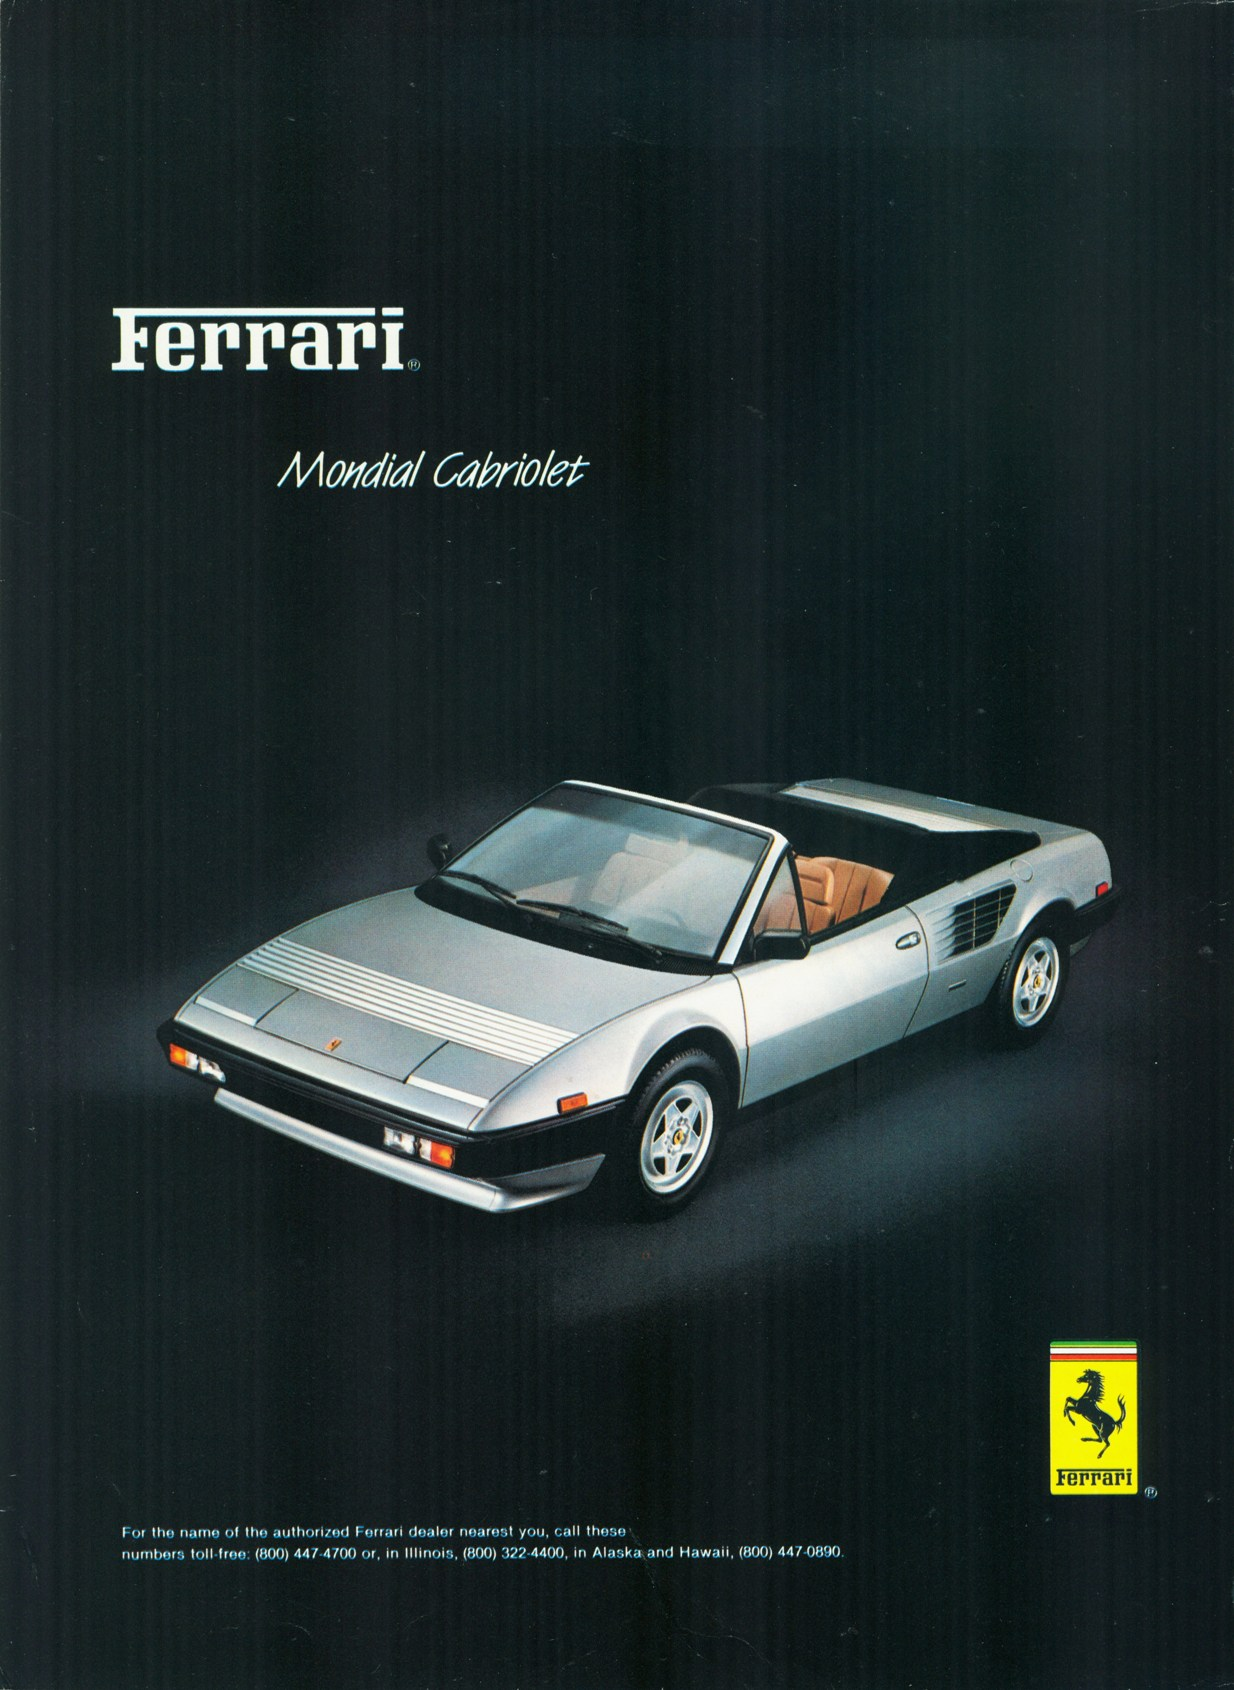 1984-Ferrari-Mondial-Cabriolet.jpg